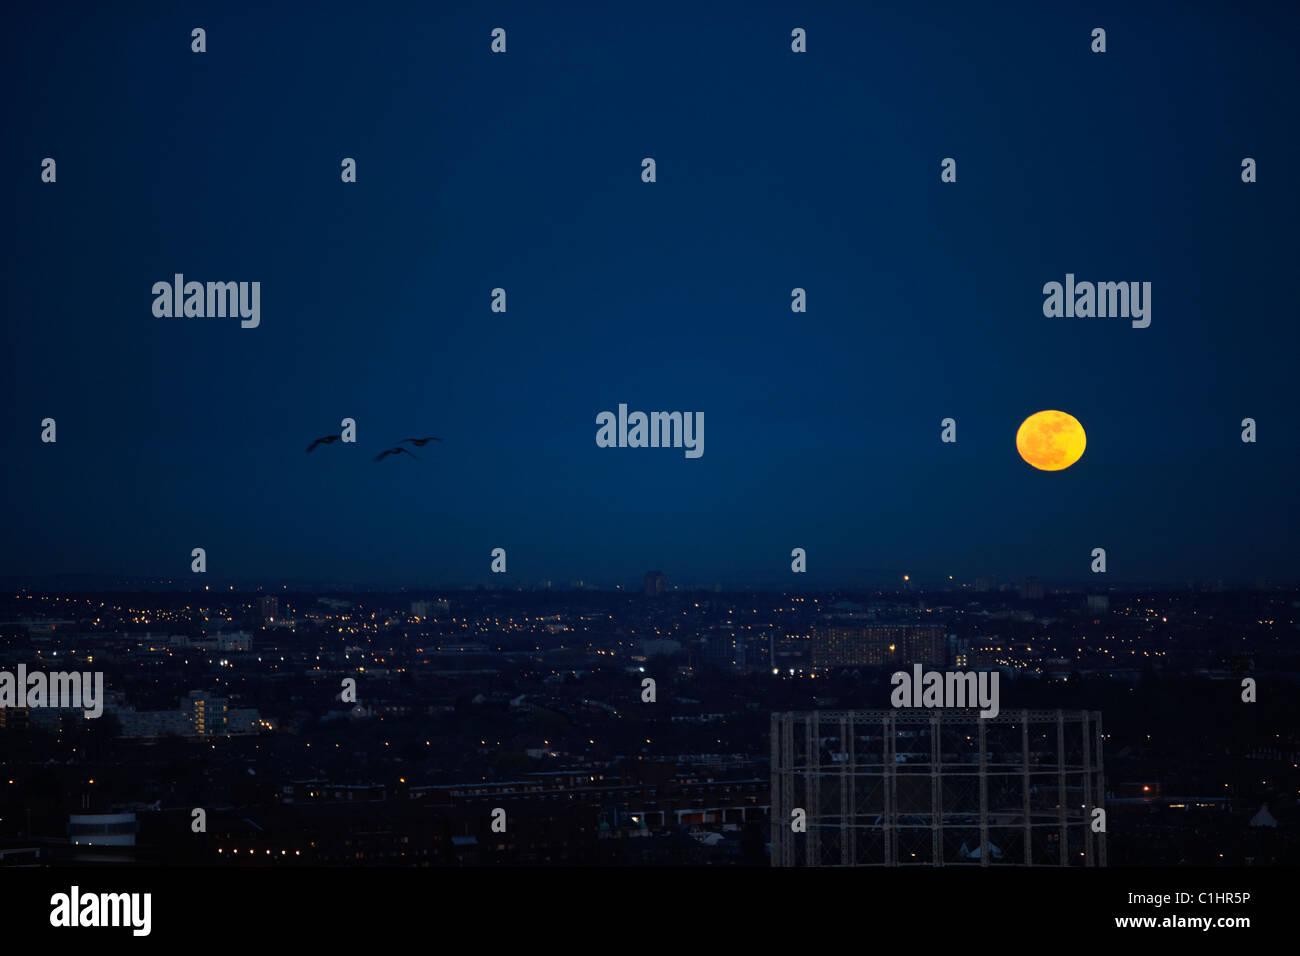 Super moon rises over London - Stock Image